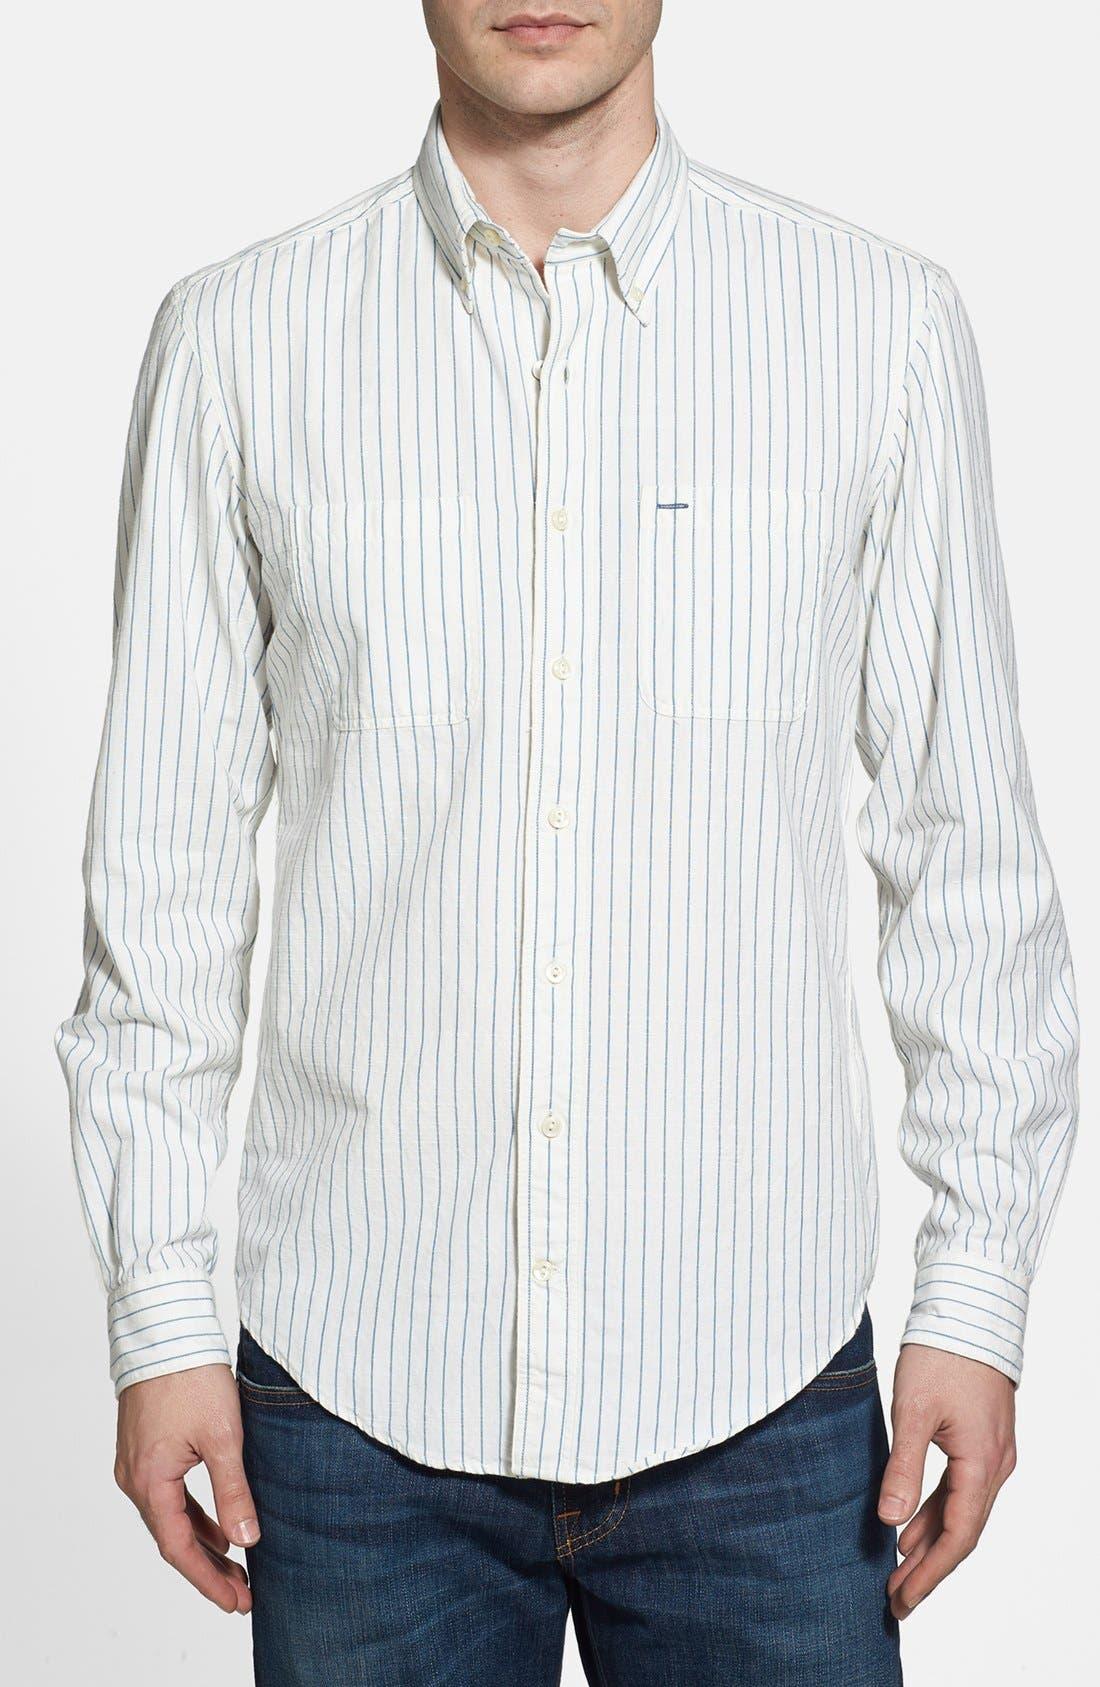 Alternate Image 1 Selected - Gant 'O.P. Indigo Stripe' Sport Shirt